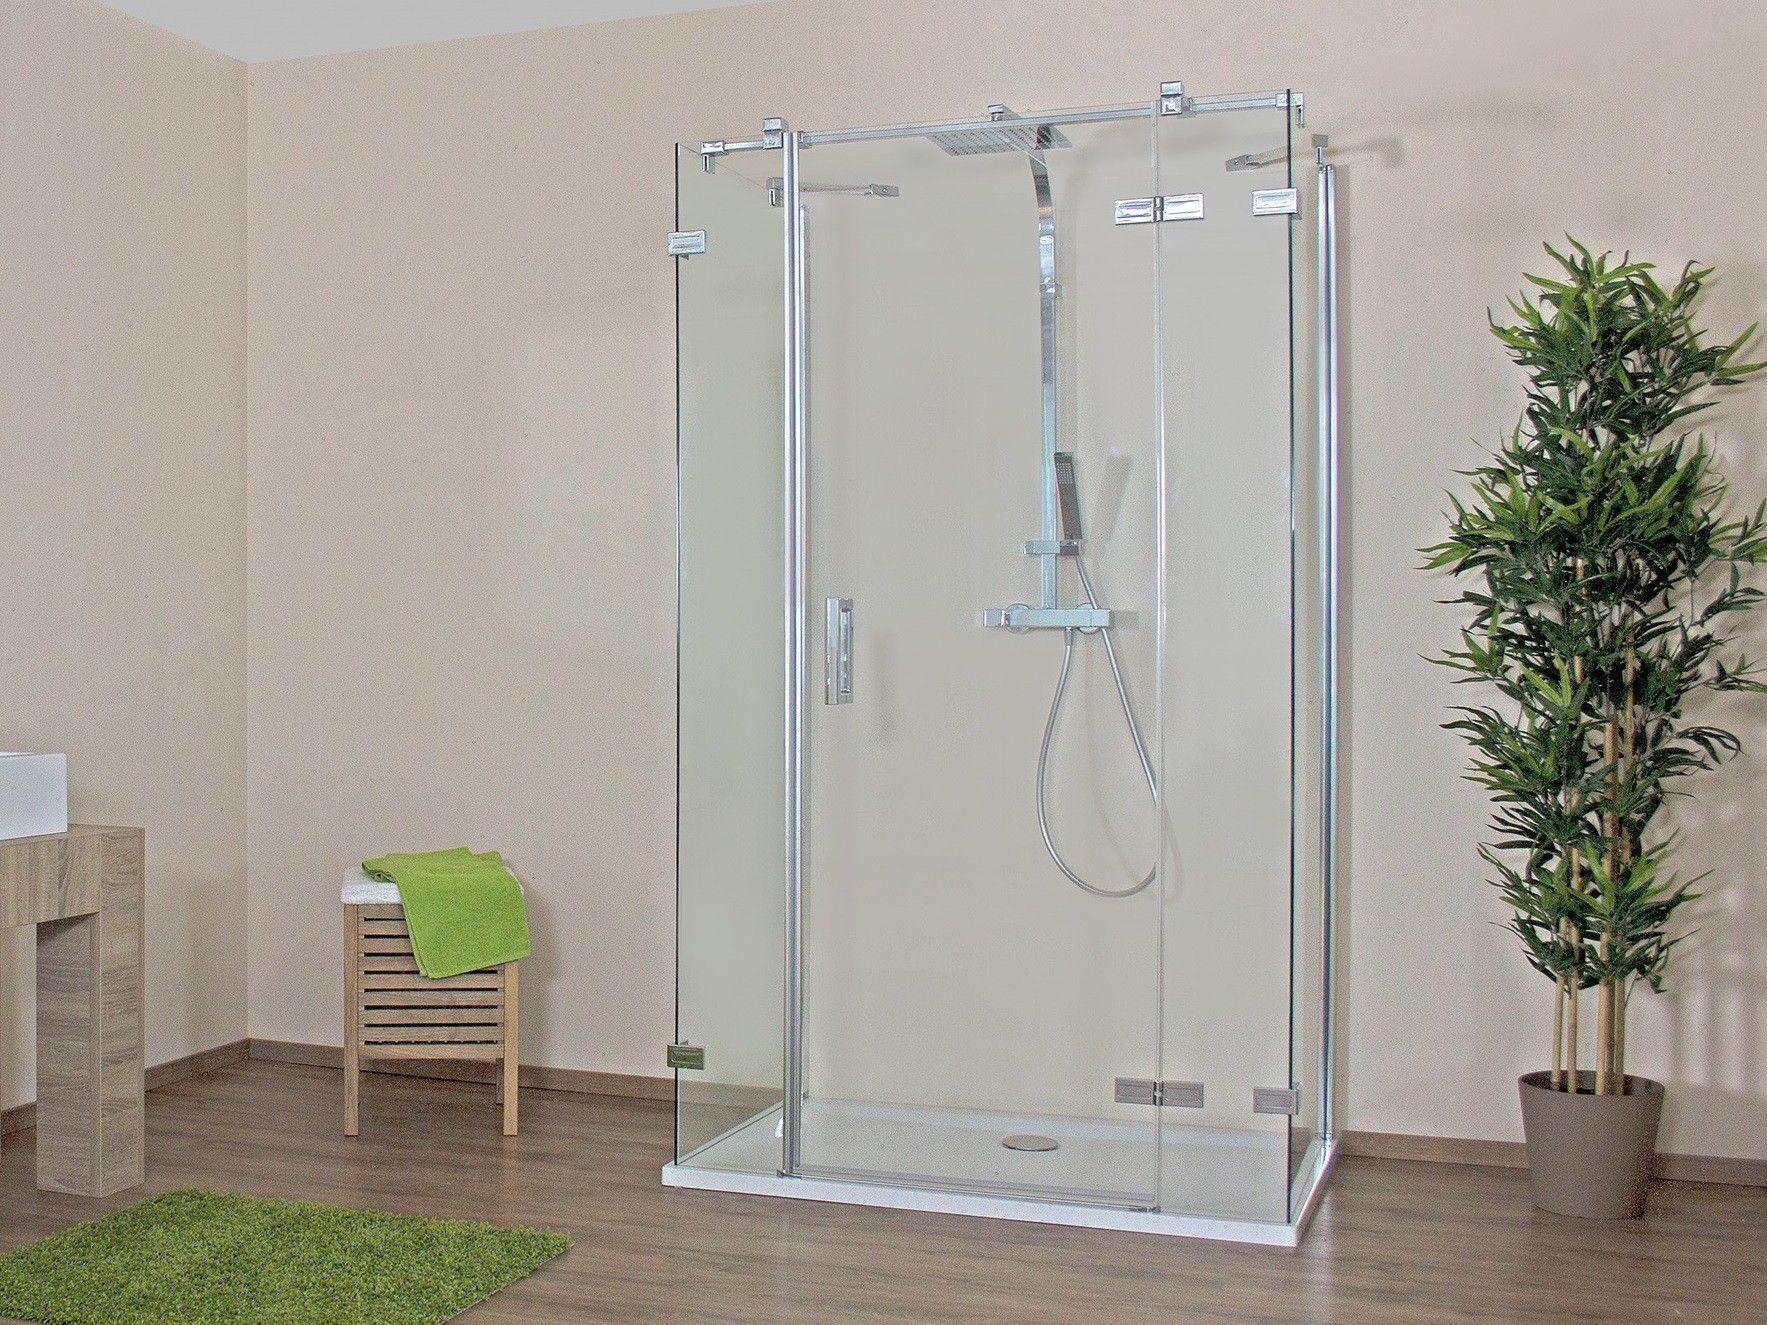 duschkabine u form 100 x 100 x 220 cm dusche u kabine. Black Bedroom Furniture Sets. Home Design Ideas